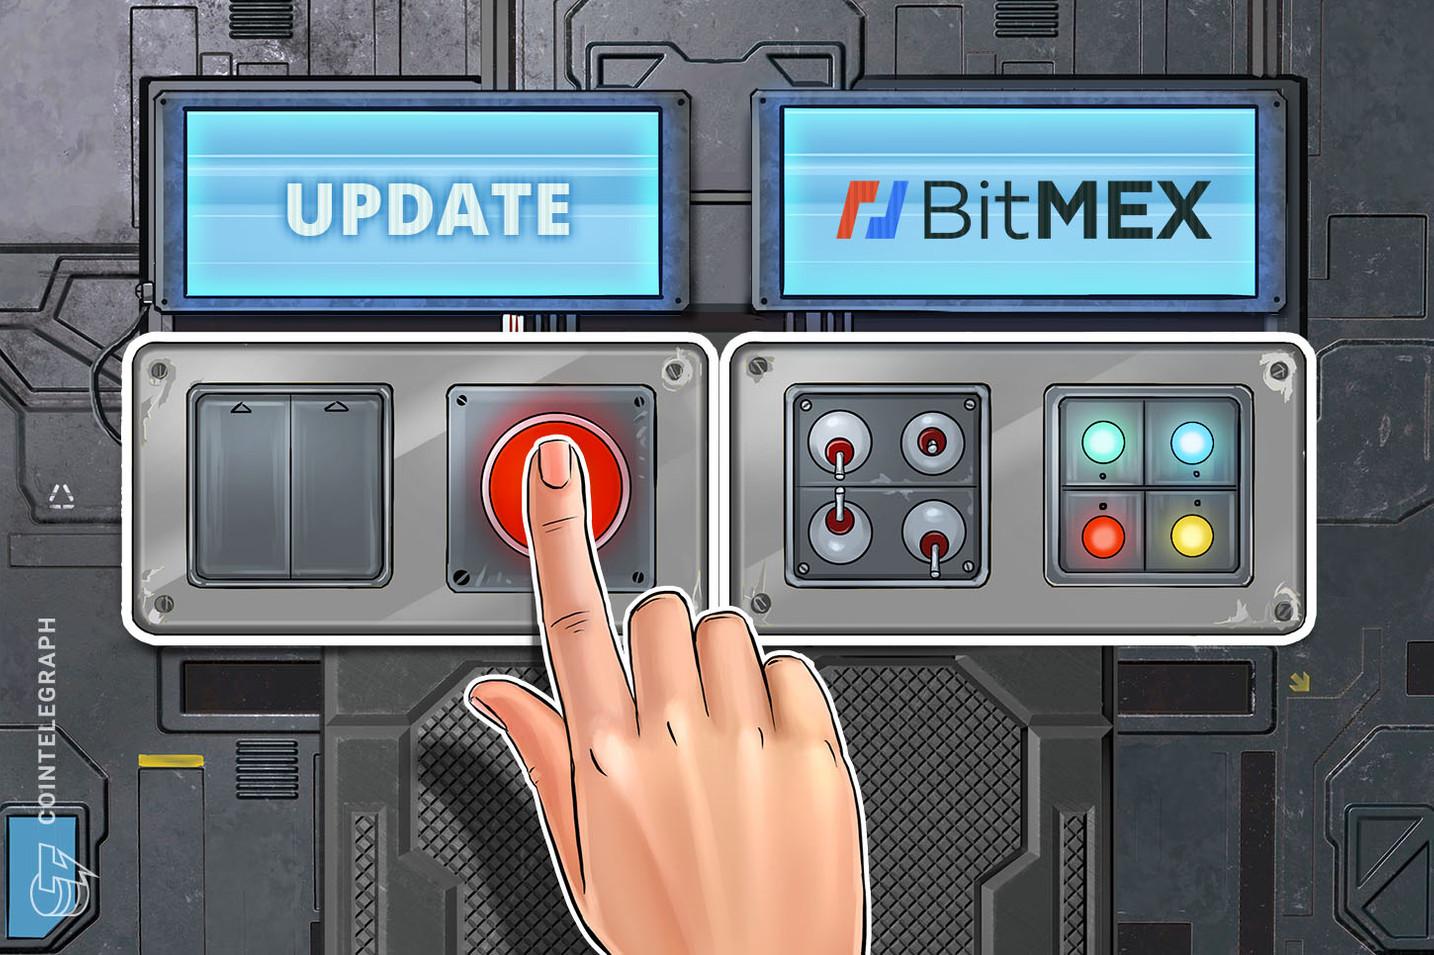 BitMEX operator joins digital finance standards and advocacy organization